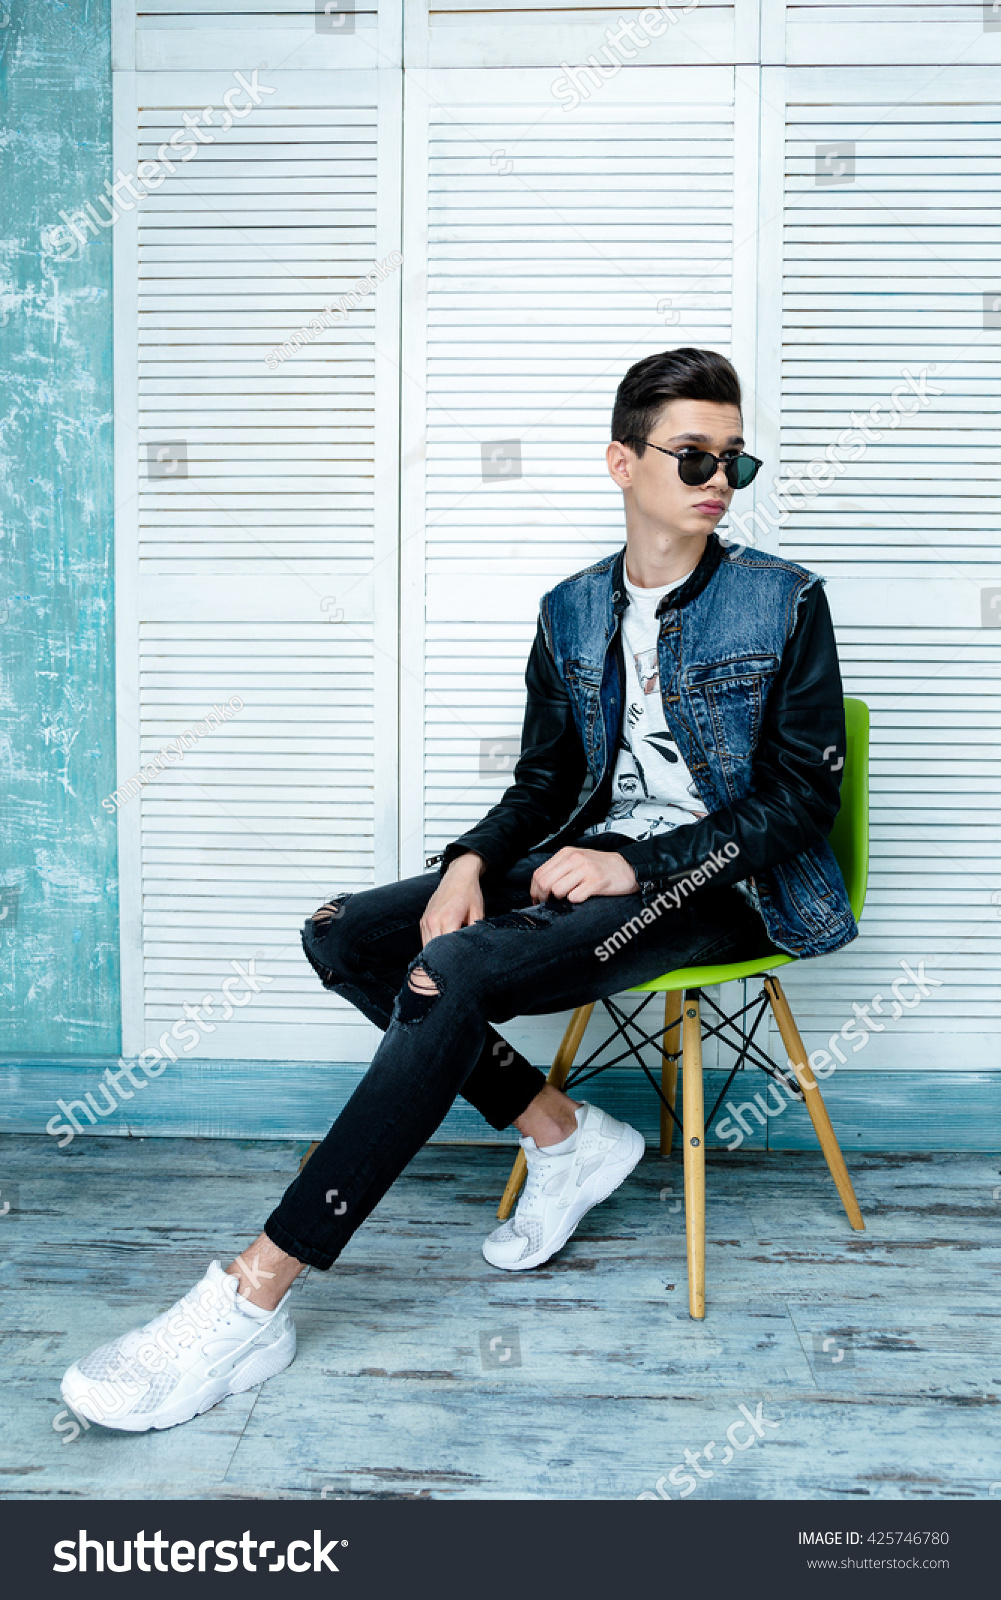 to wear - Model stylish boy video